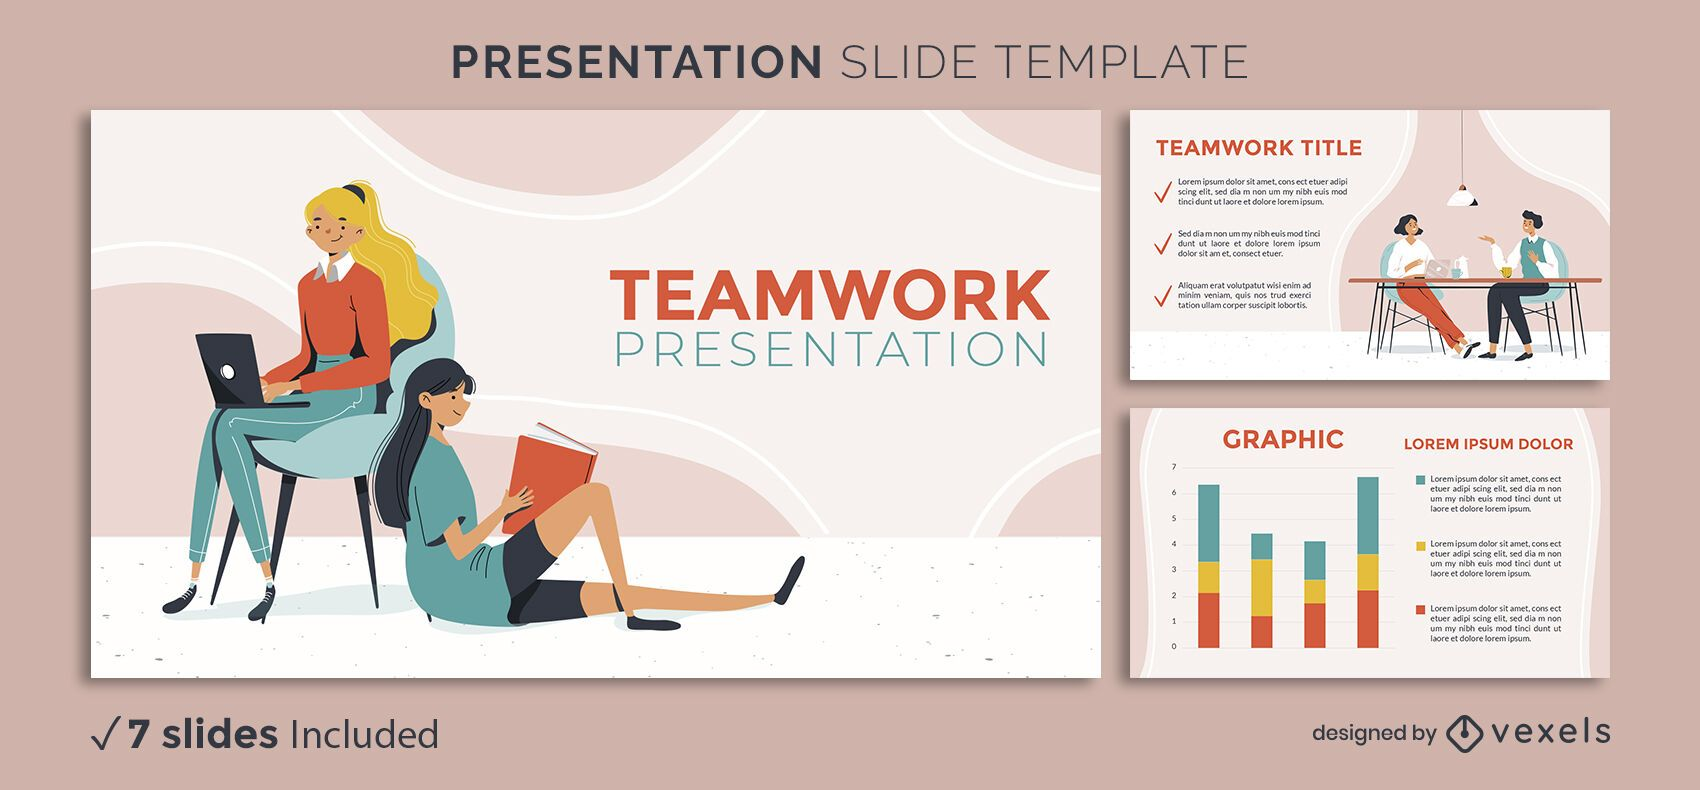 Teamwork Characters Presentation Template